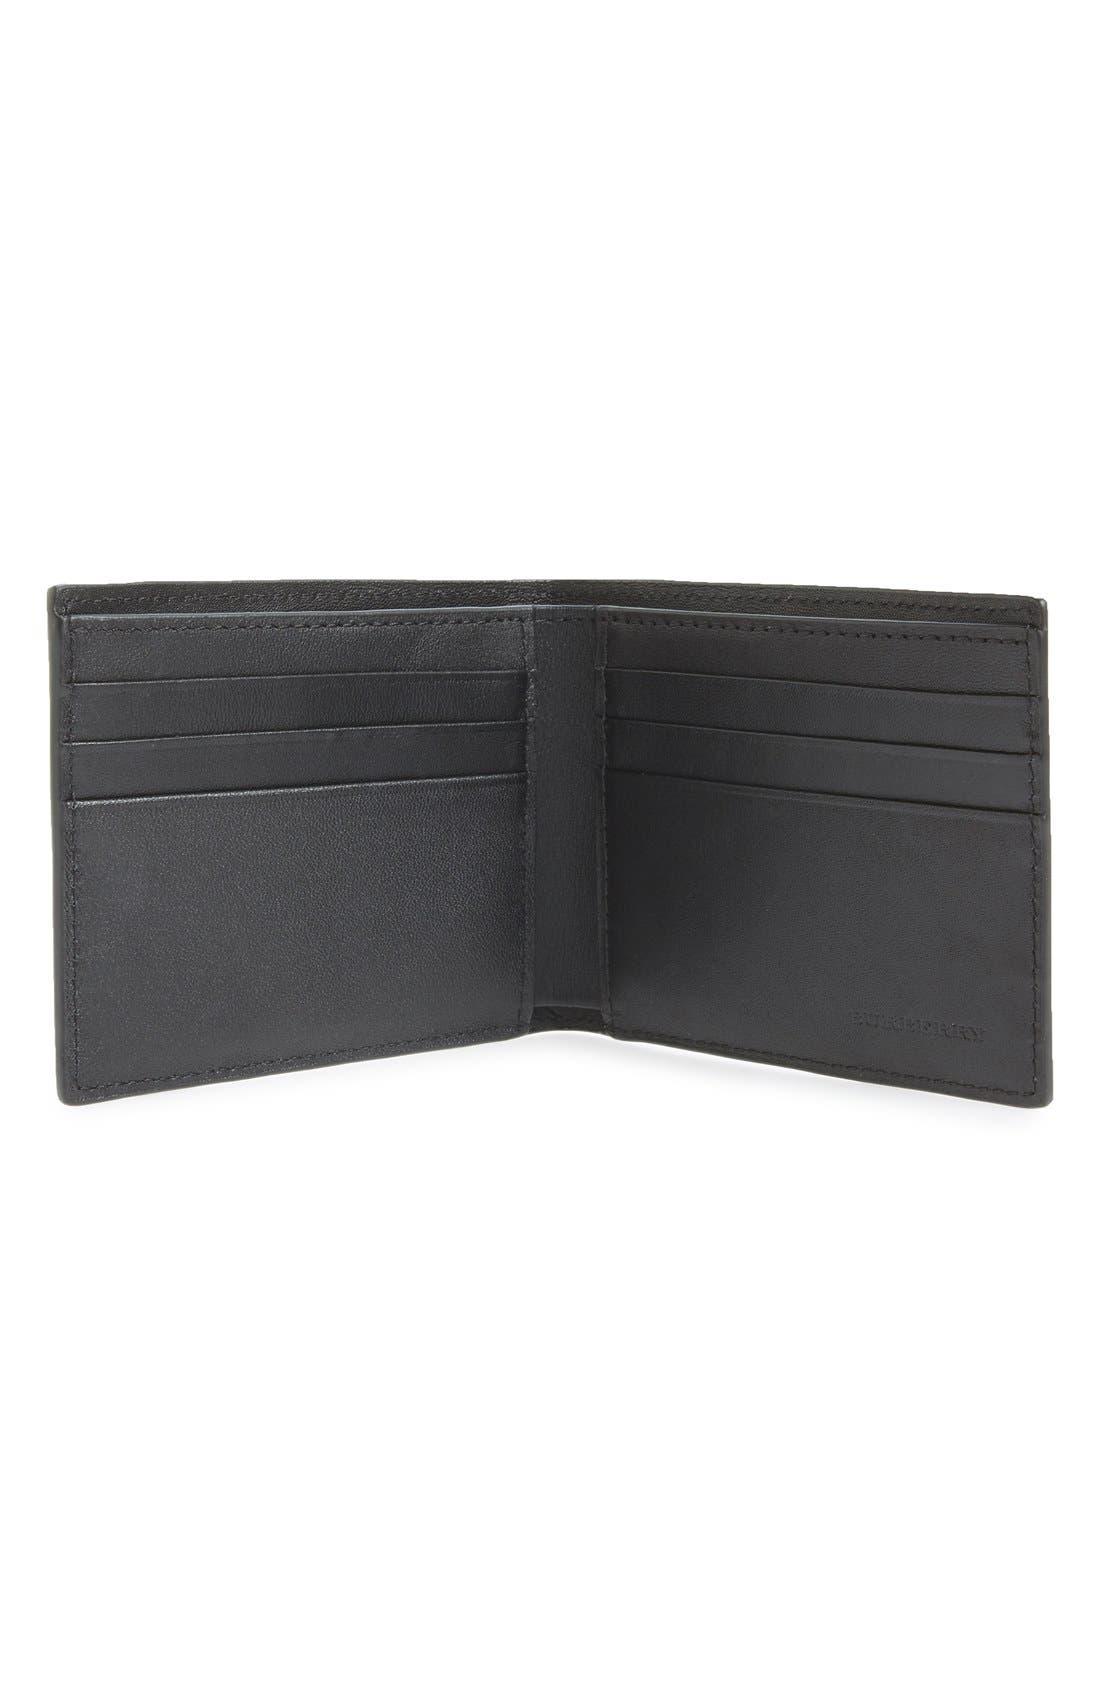 Check Wallet,                             Alternate thumbnail 3, color,                             NAVY/ BLACK